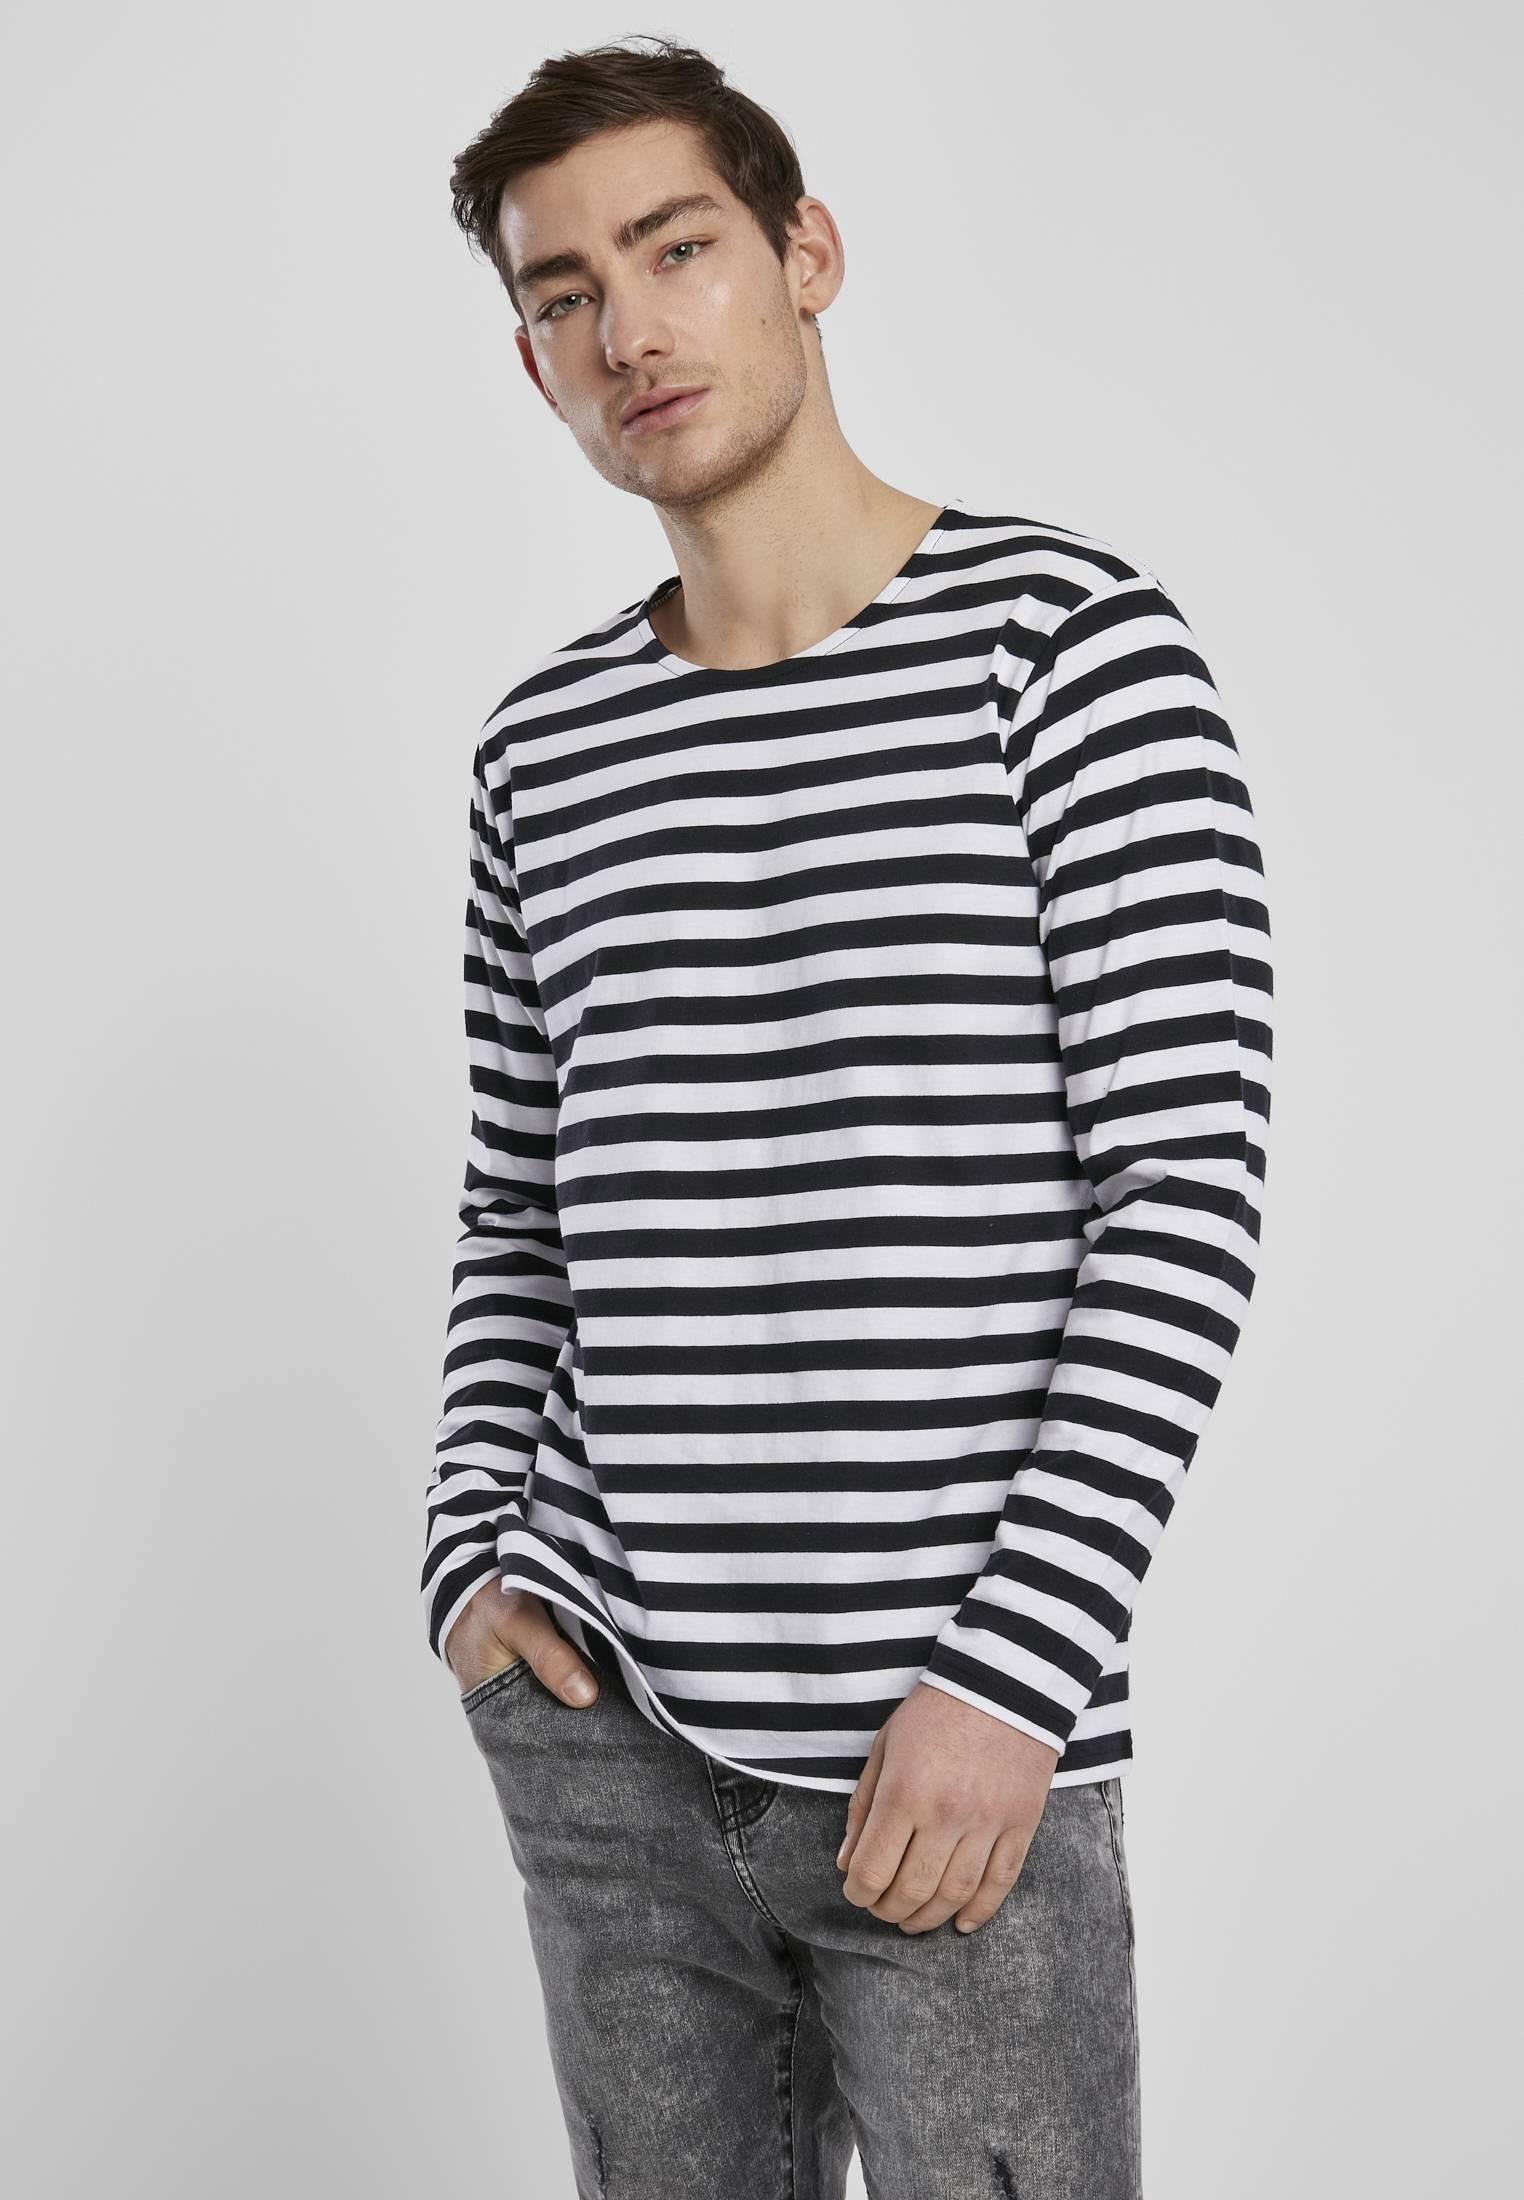 Urban Classics Regular Stripe LS white/black - L